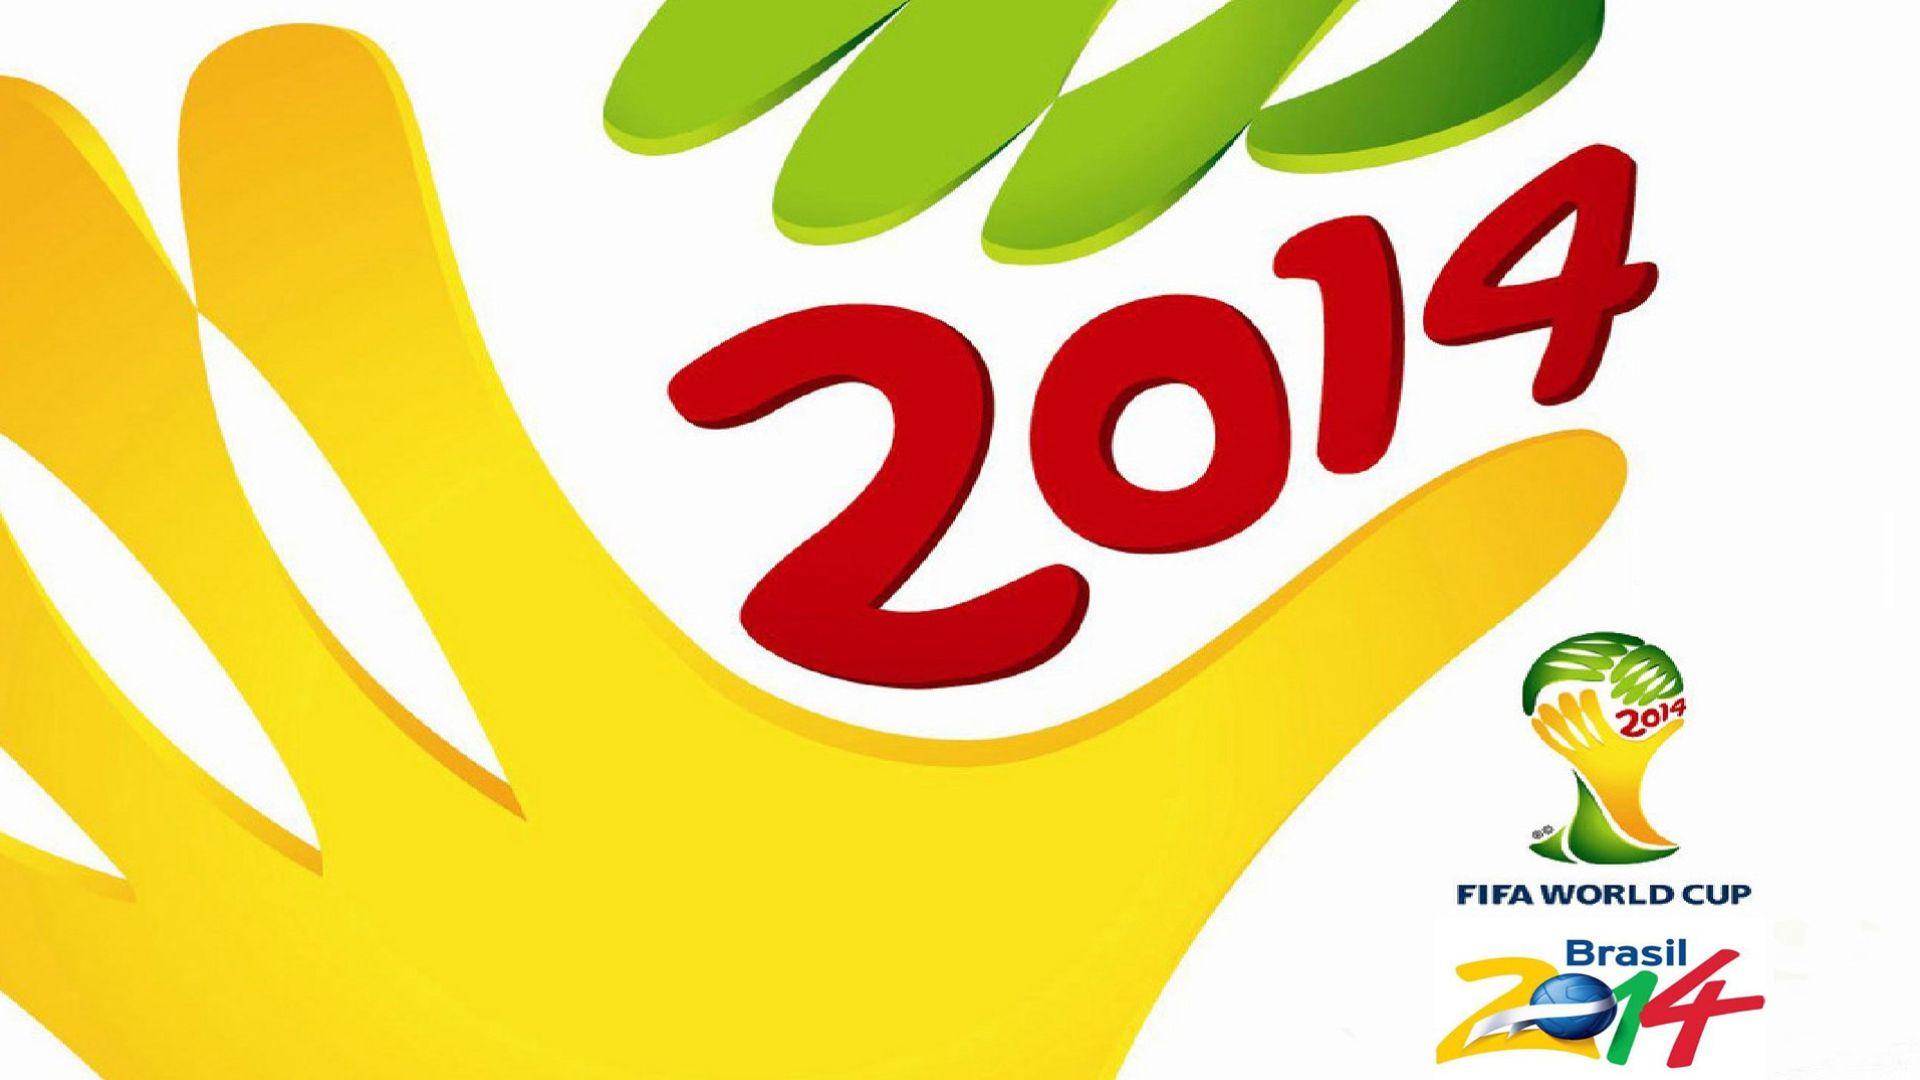 Football-World-Cup-HD-wallpaper-wp3605711-1